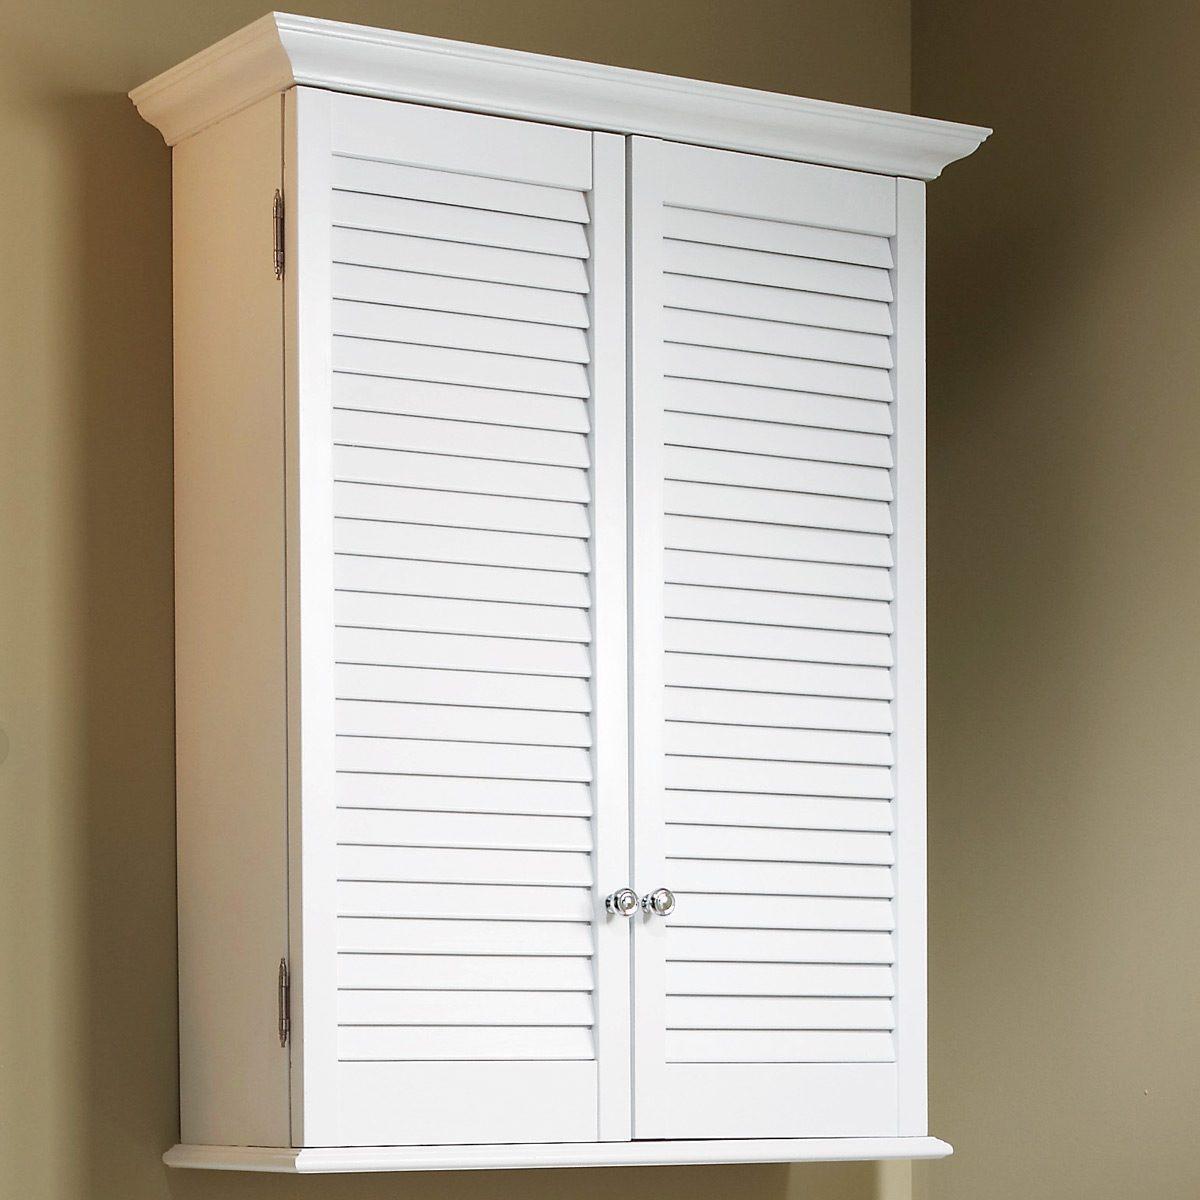 FH07OCT_482_56_043-1 bathroom cabinet